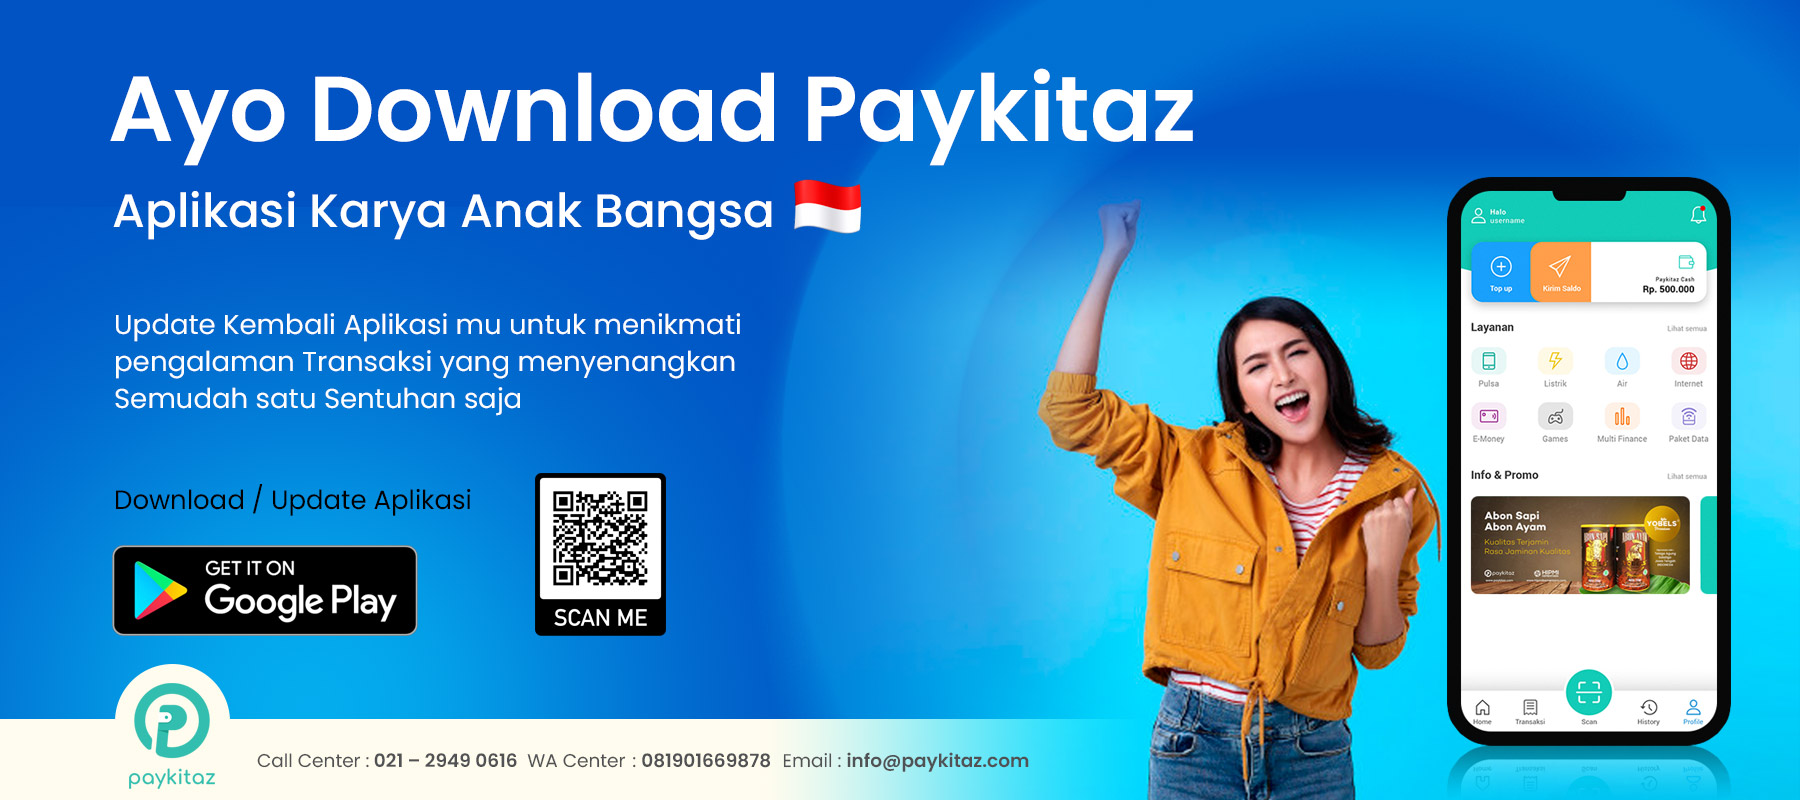 download-paykitaz-banner-horizontal